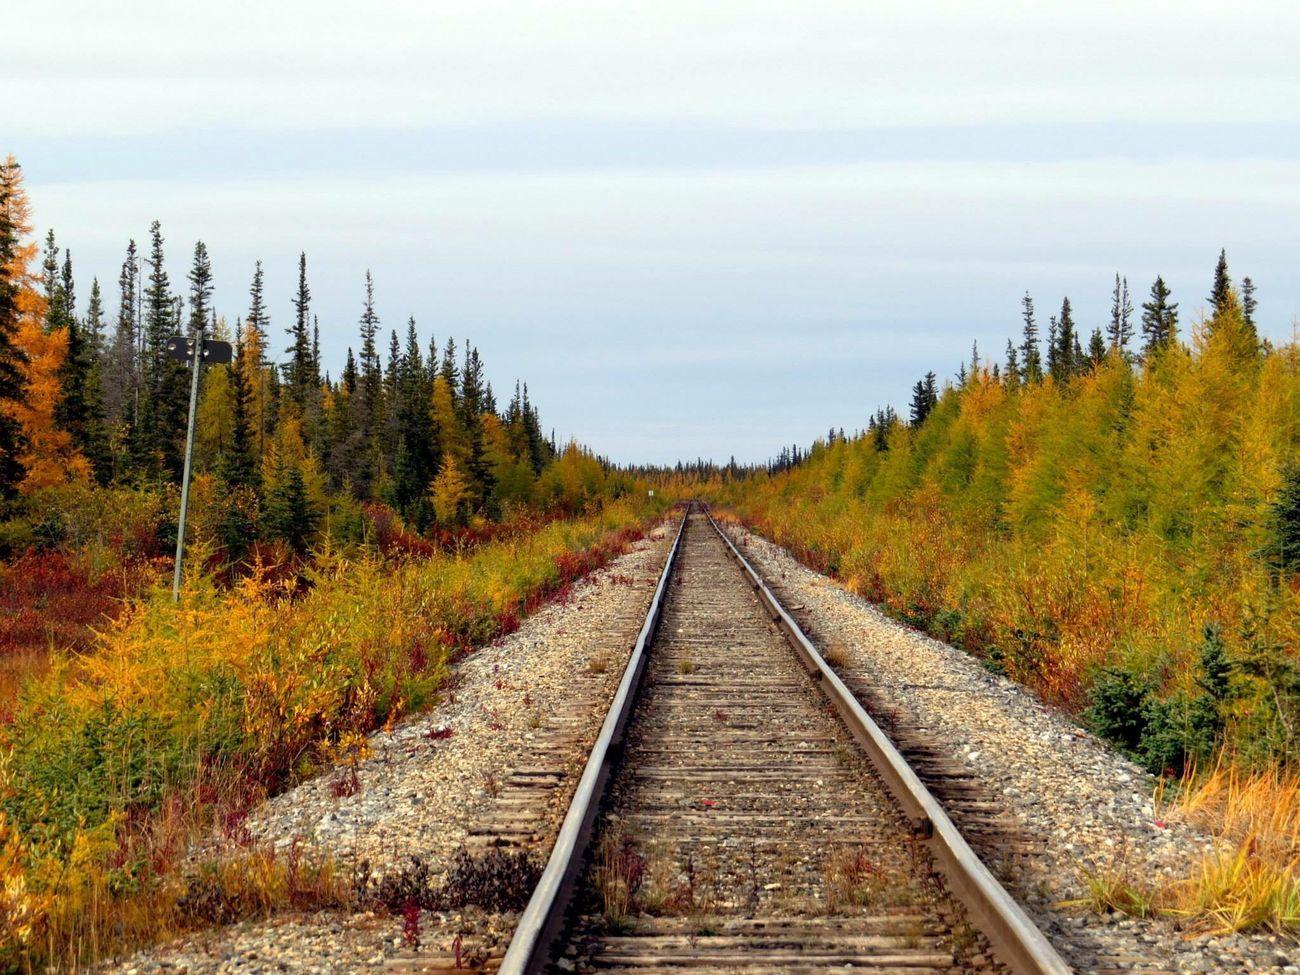 Colourful fall Fall Time Railway Track